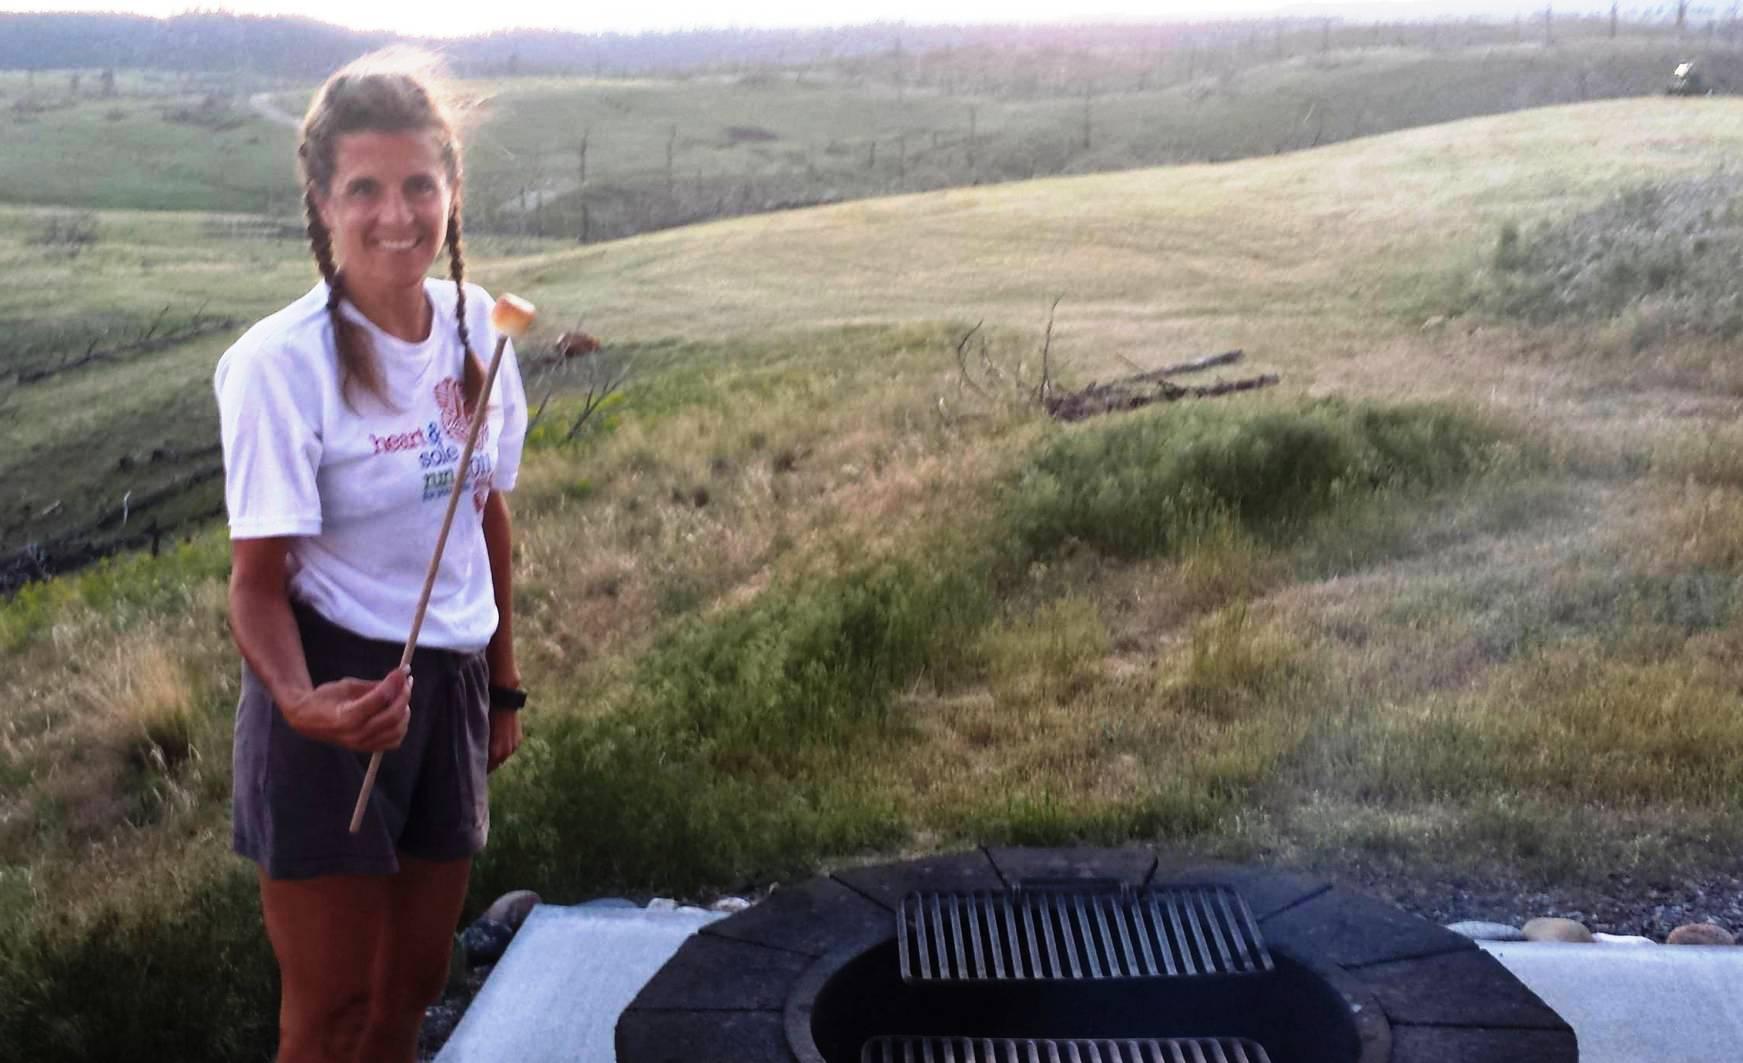 2015-06-08 - Helena Roasting Marshmallows at the Ranch - June 8 2015.jpg